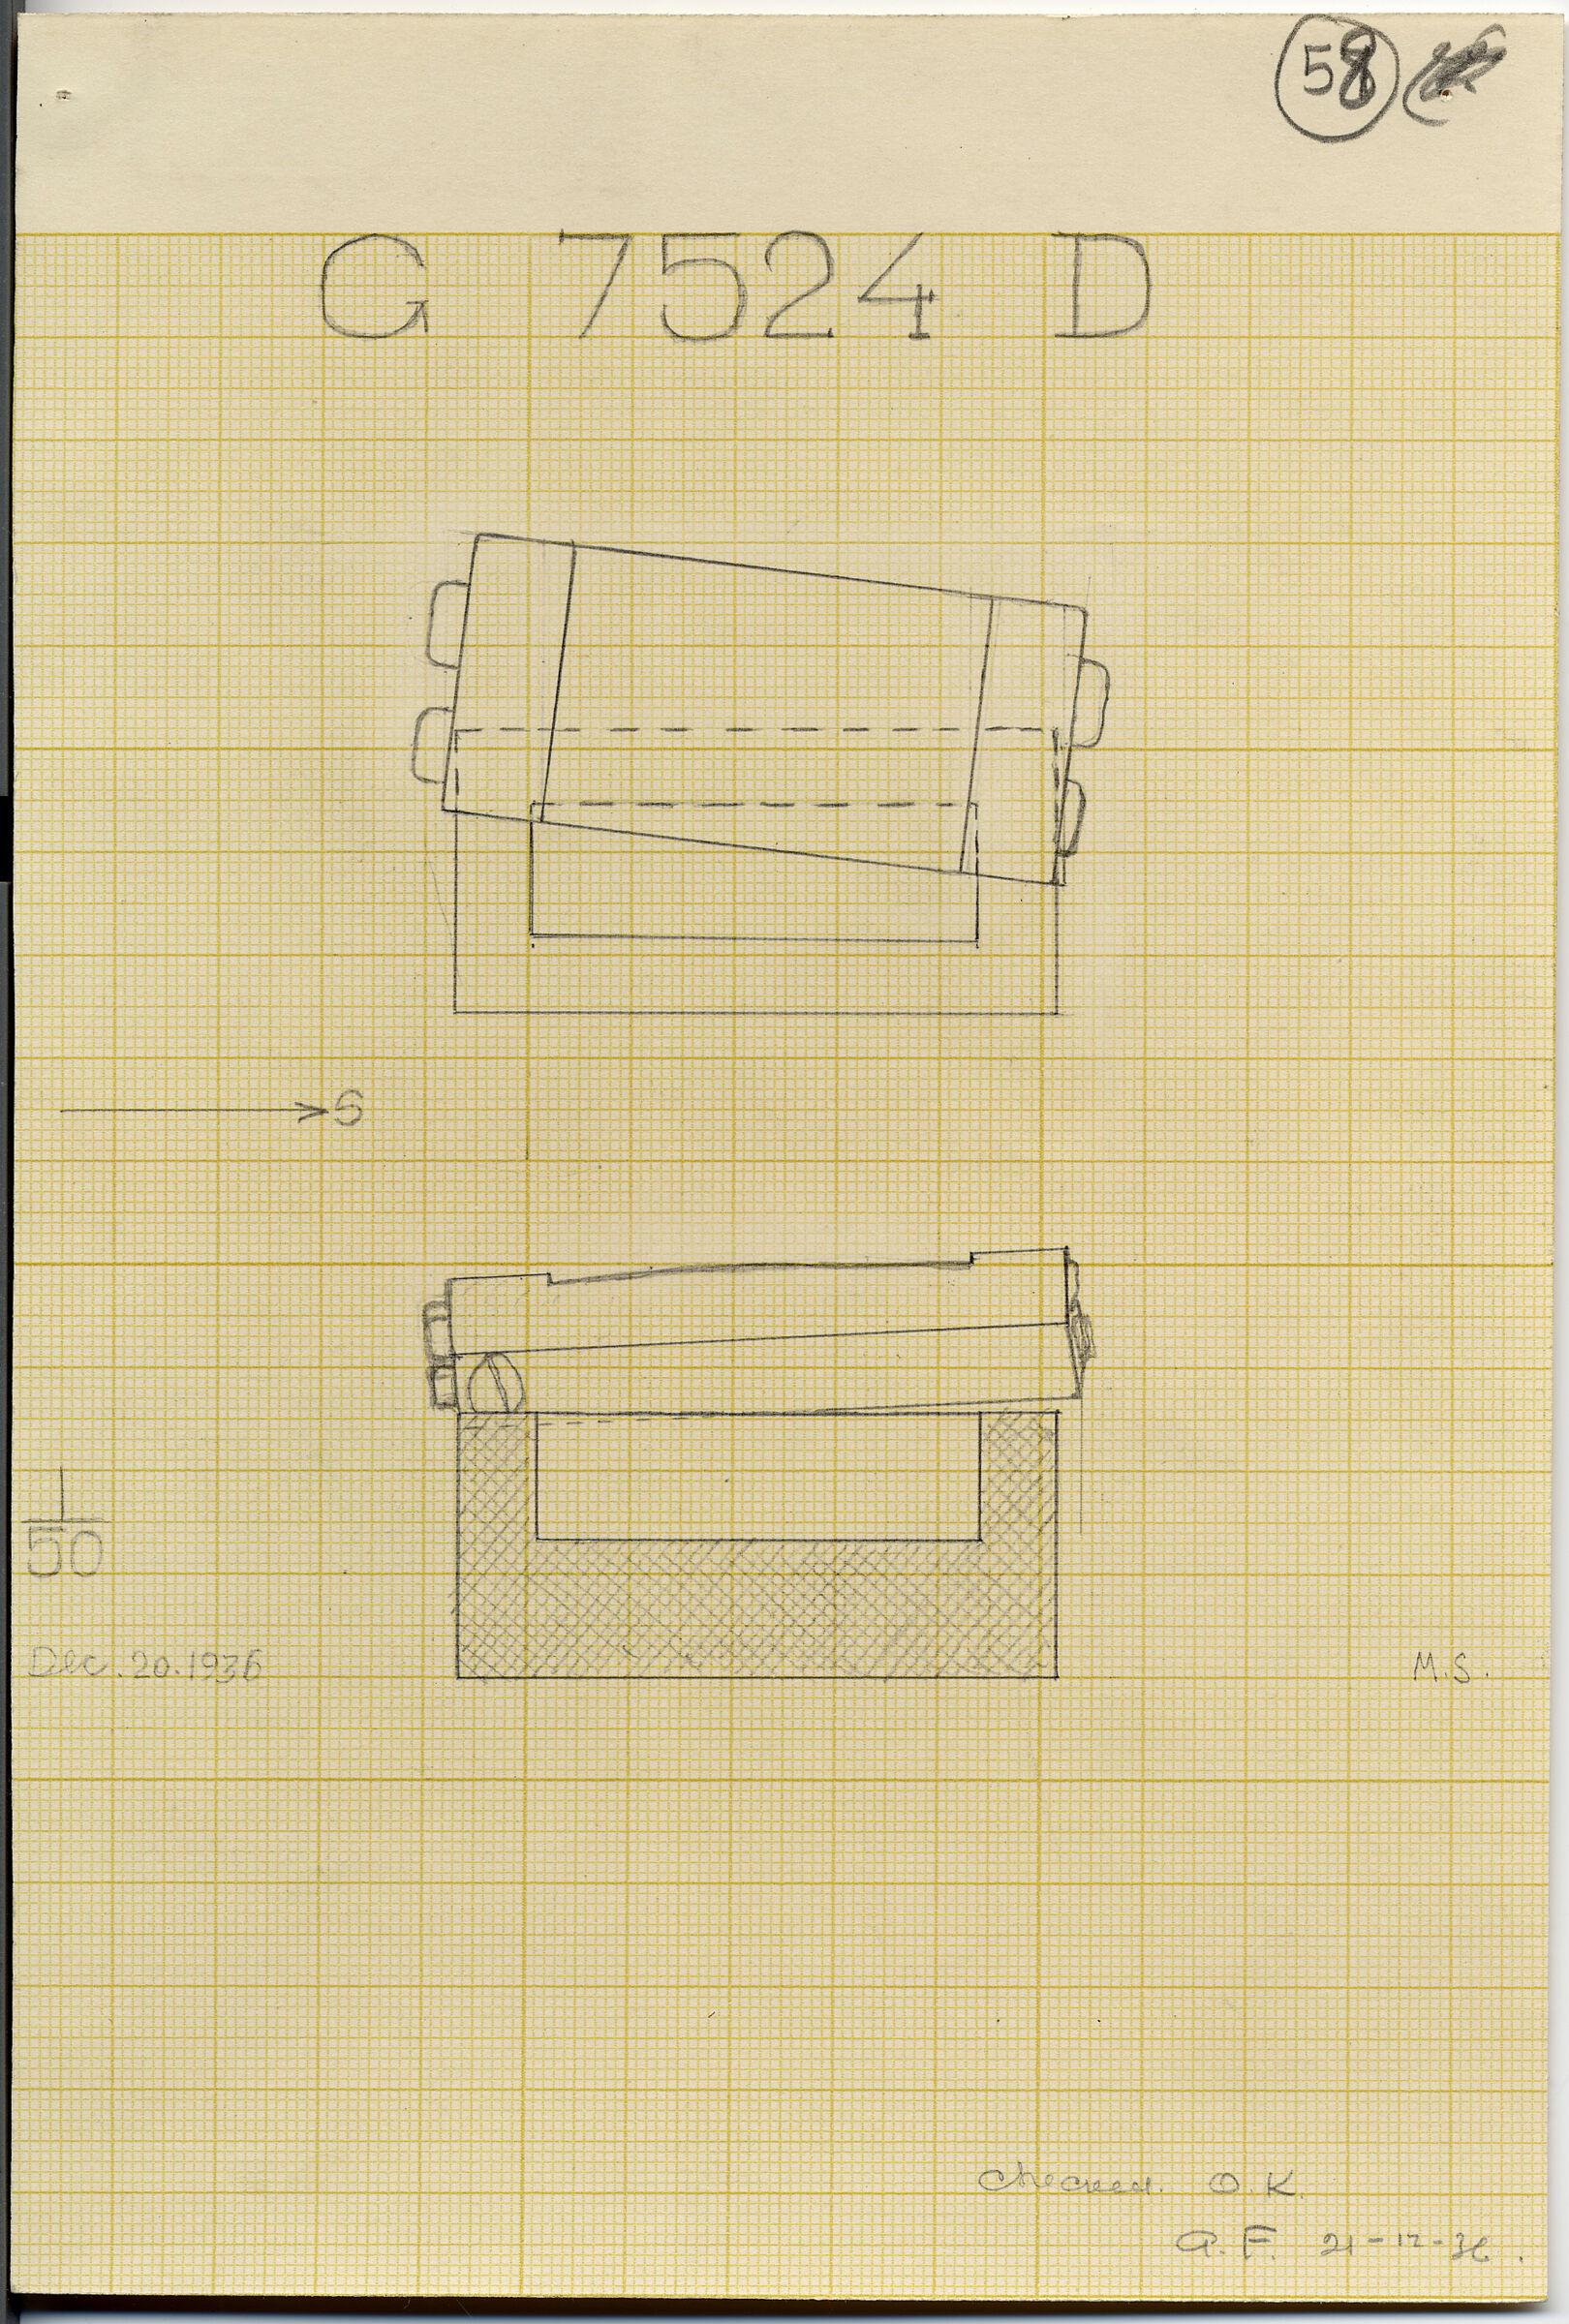 Maps and plans: G 7524, Shaft D, sarcophagus